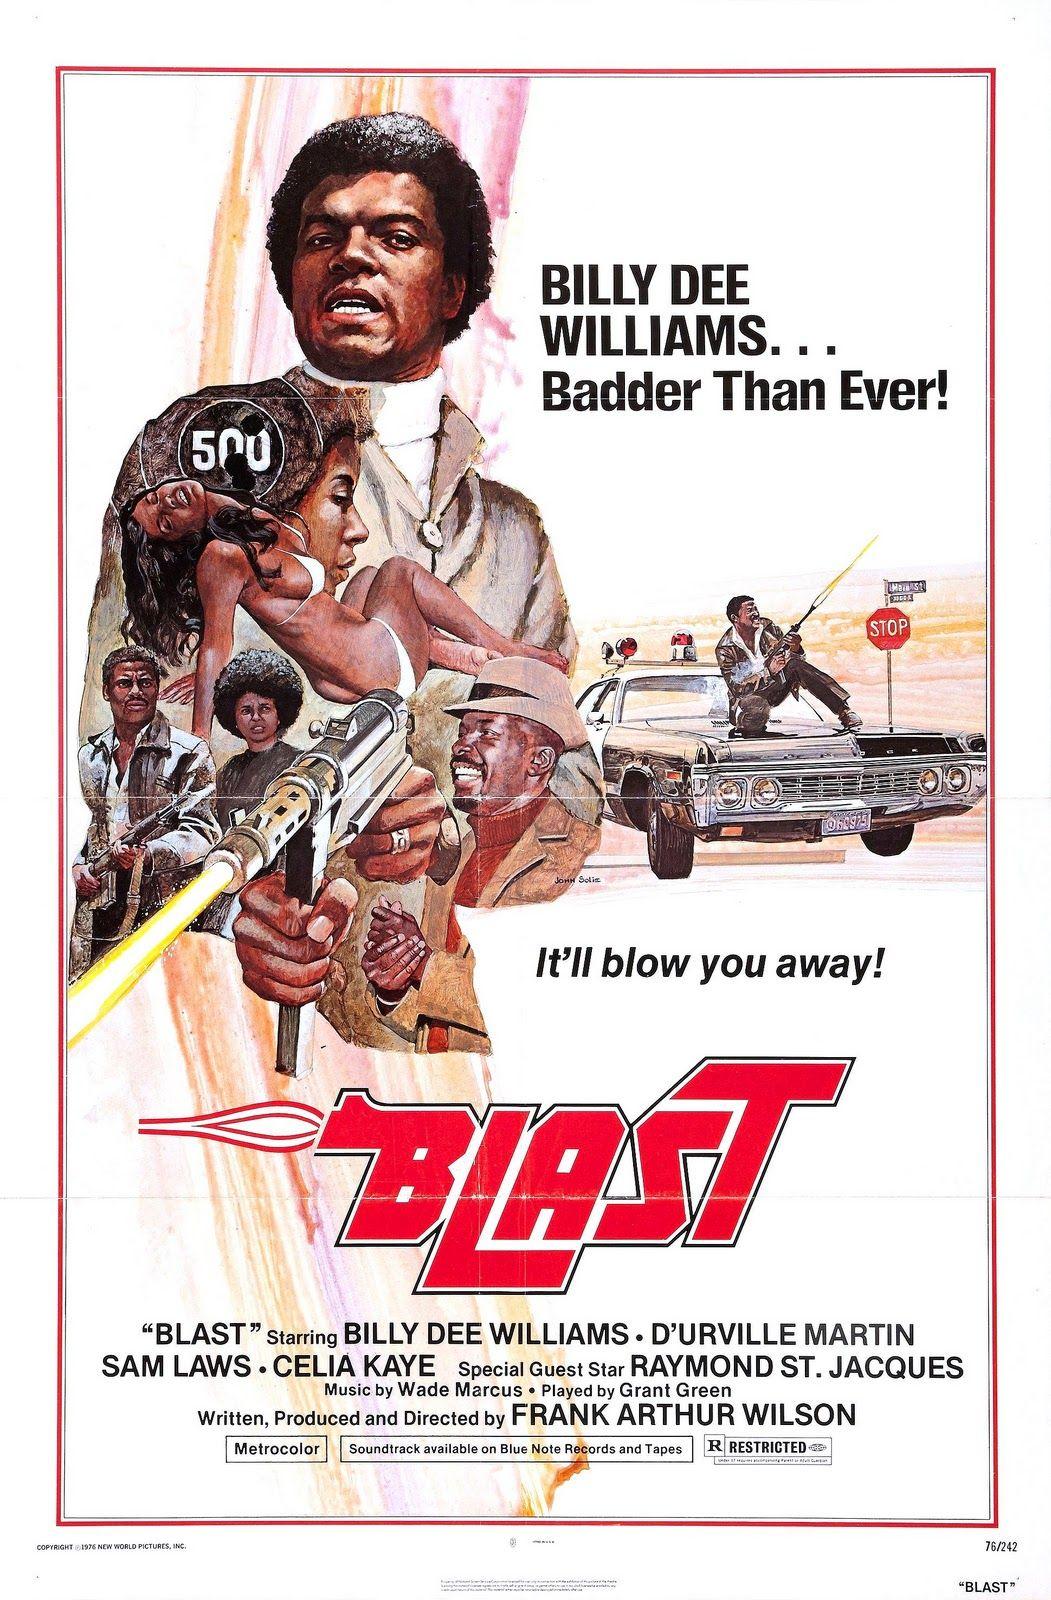 Blast movie blaxploitation 70s poster exploitation